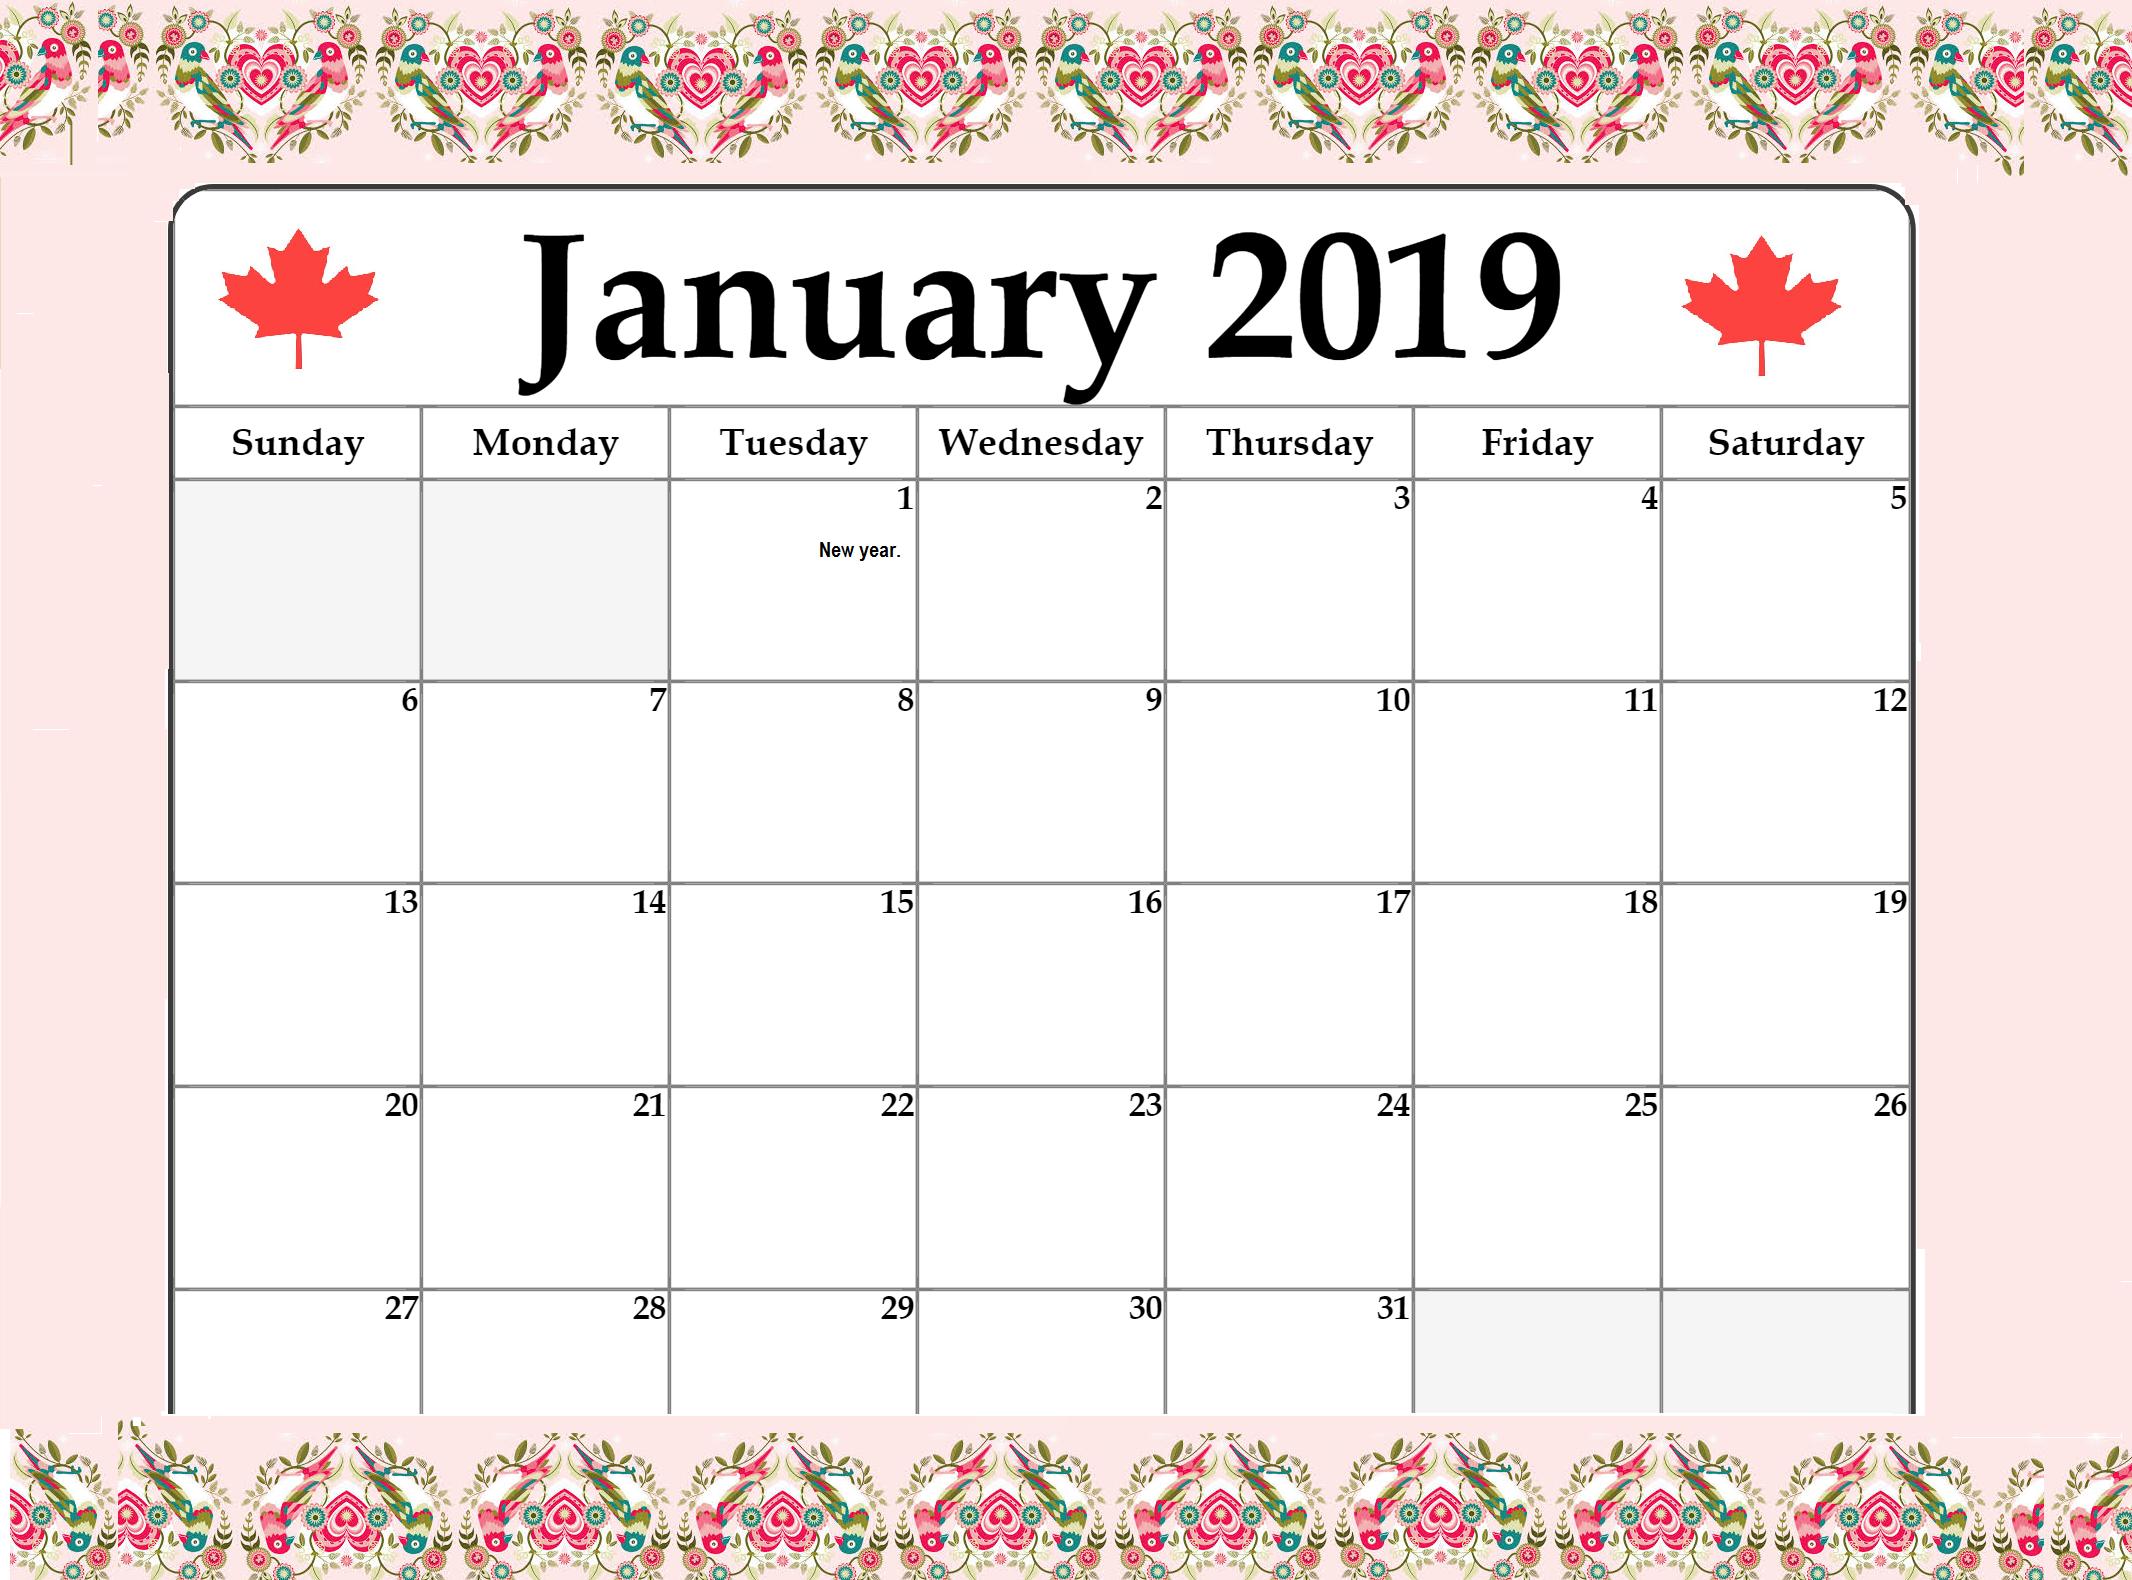 January 2019 Local Holiday Canada Calendar